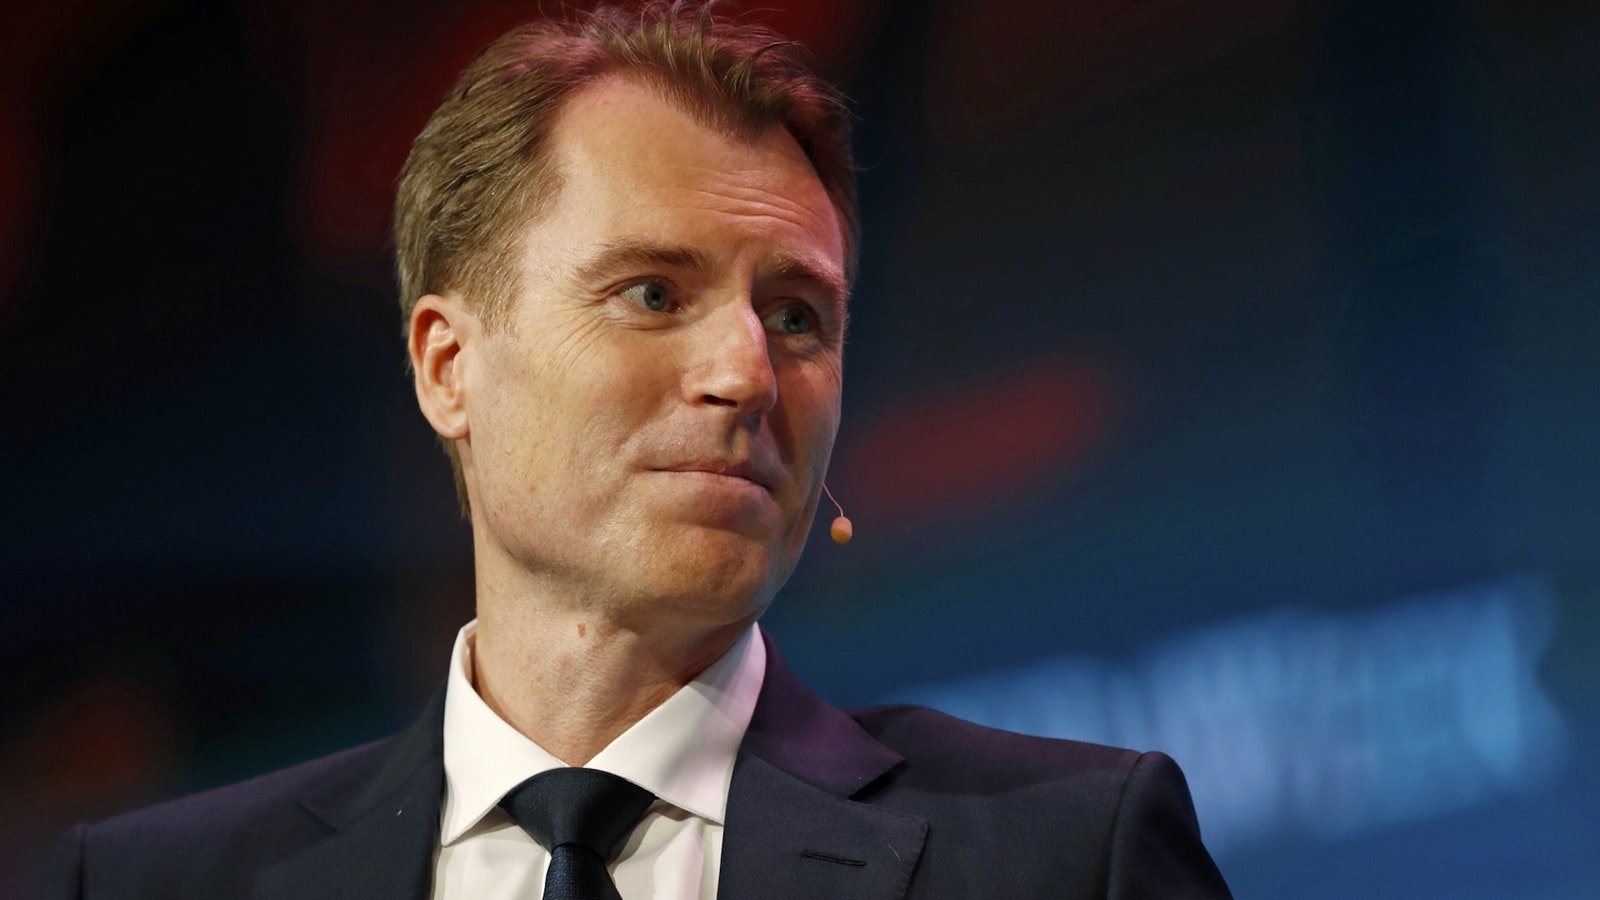 Katerra CEO Paal Kibsgaard, shown in 2018. Photo: Bloomberg